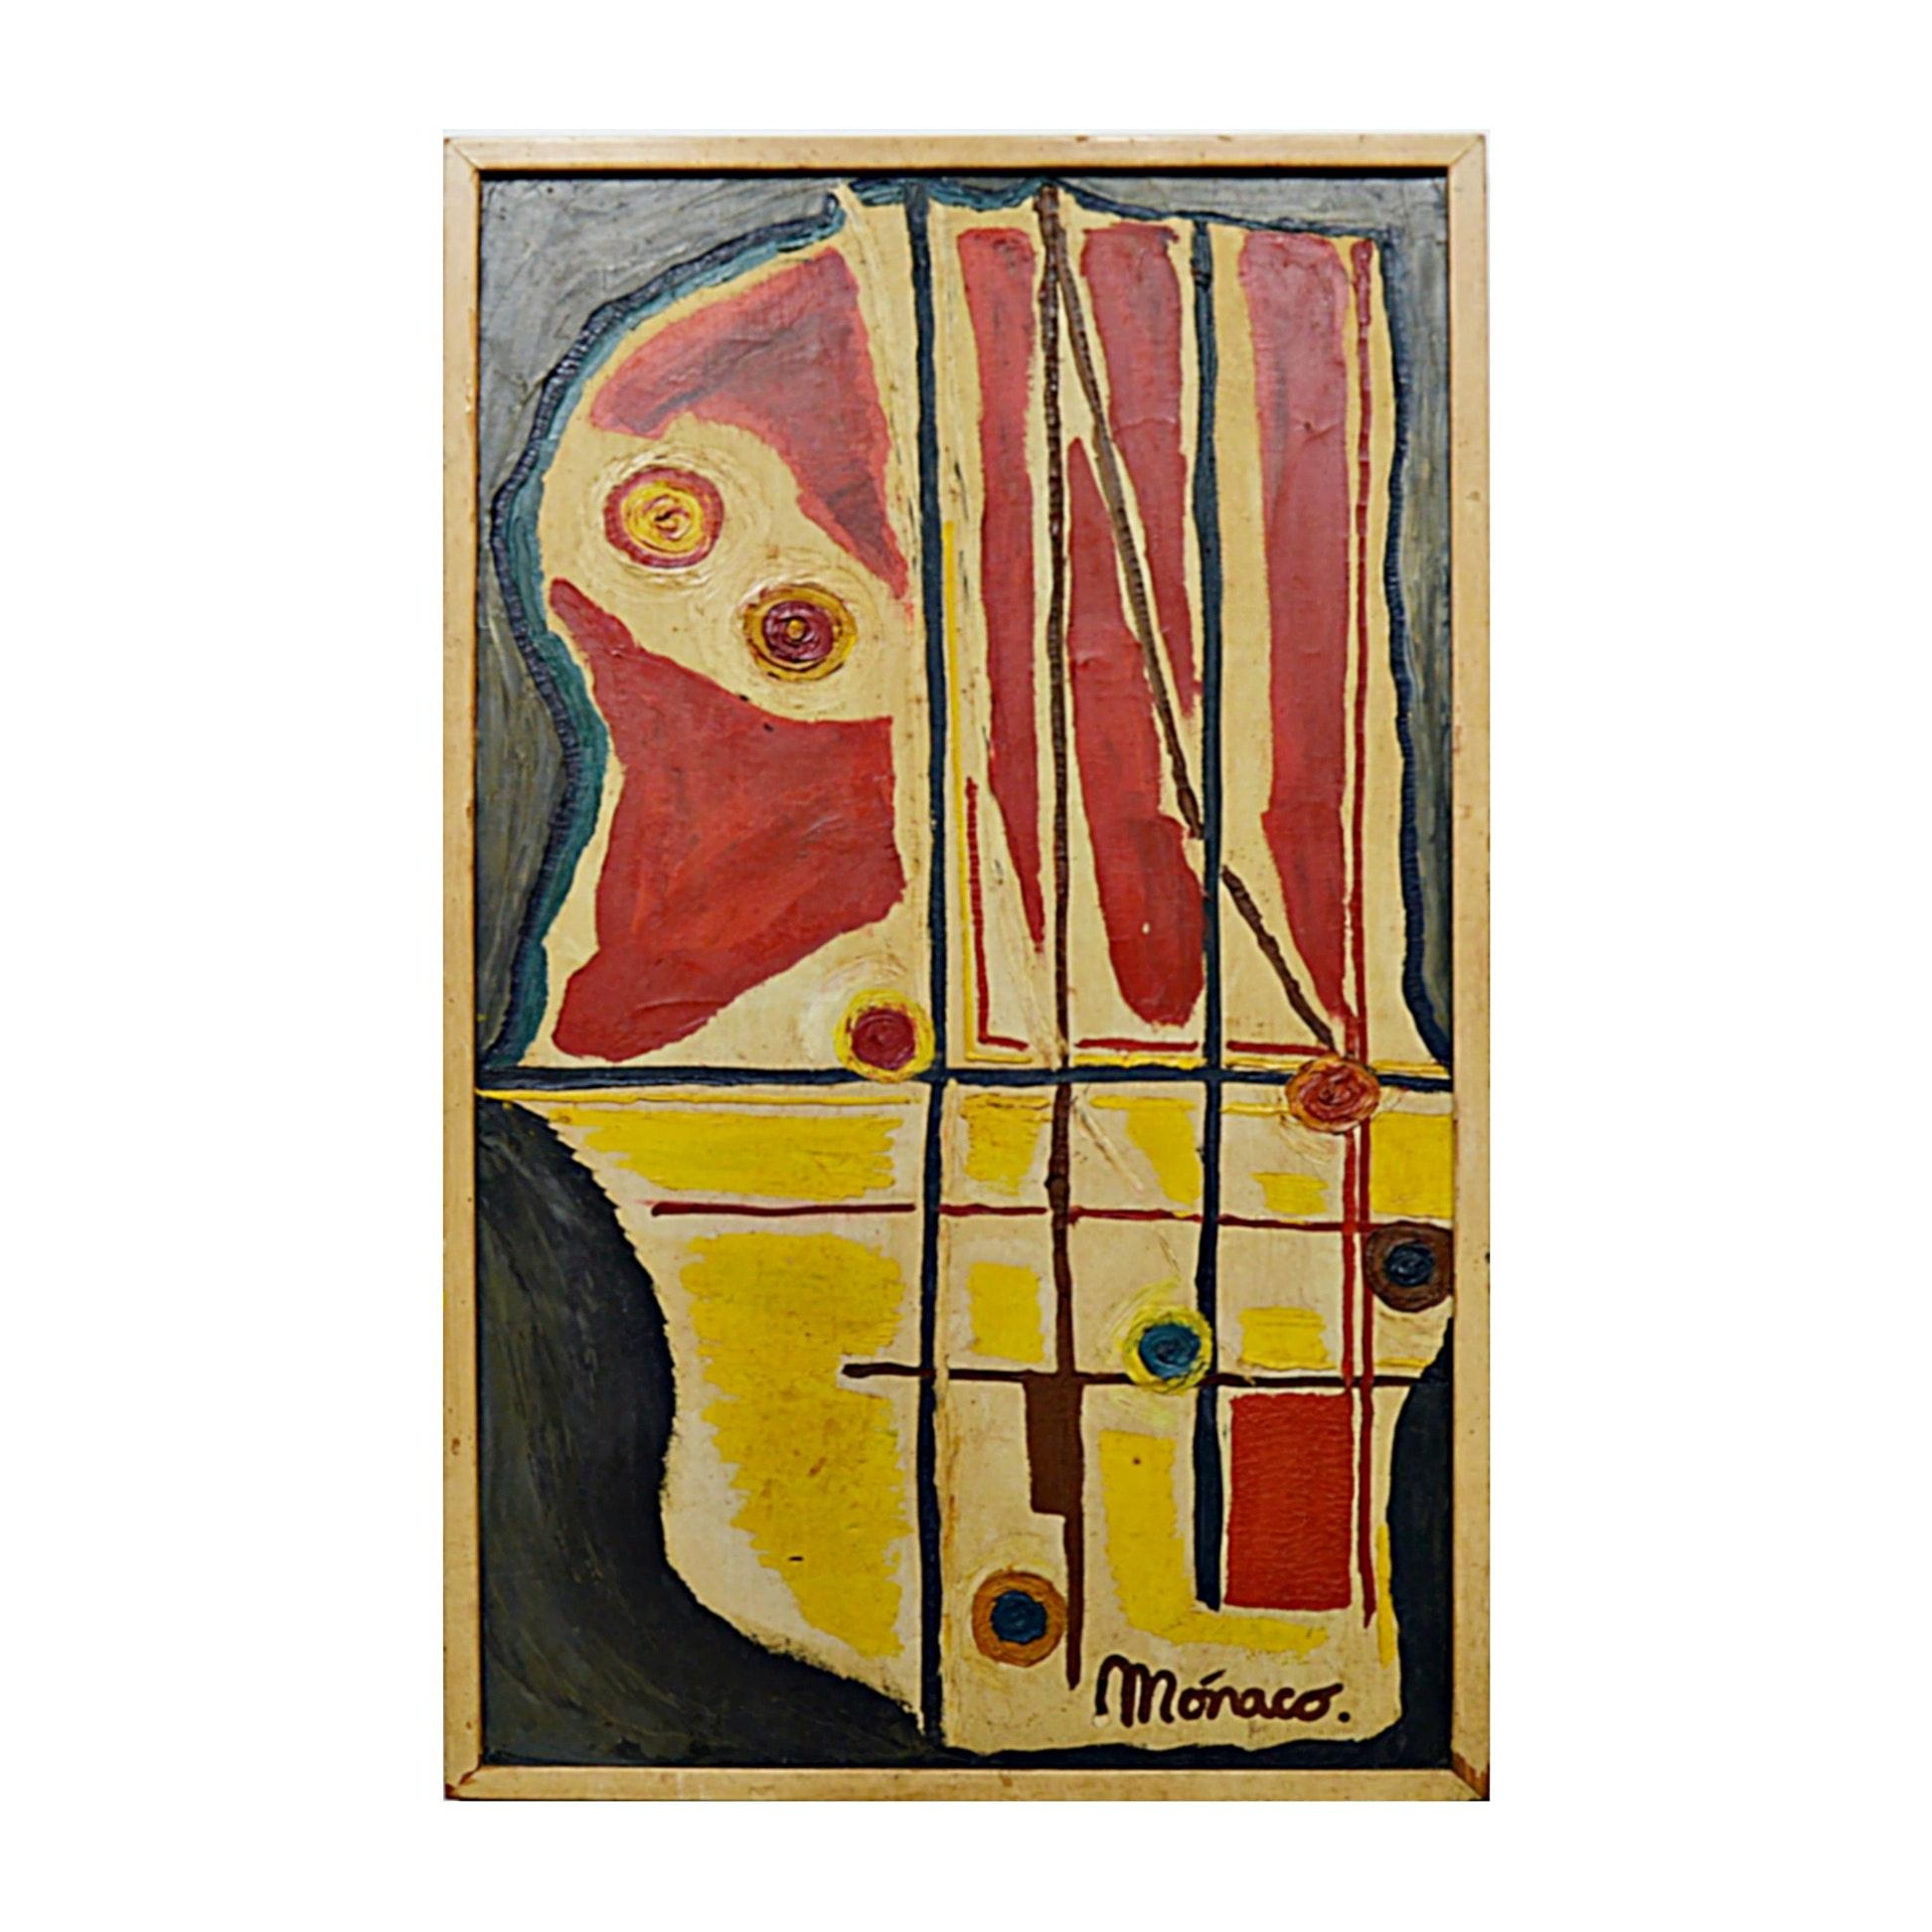 Monaco Original Signed Cubist Oil on Canvas